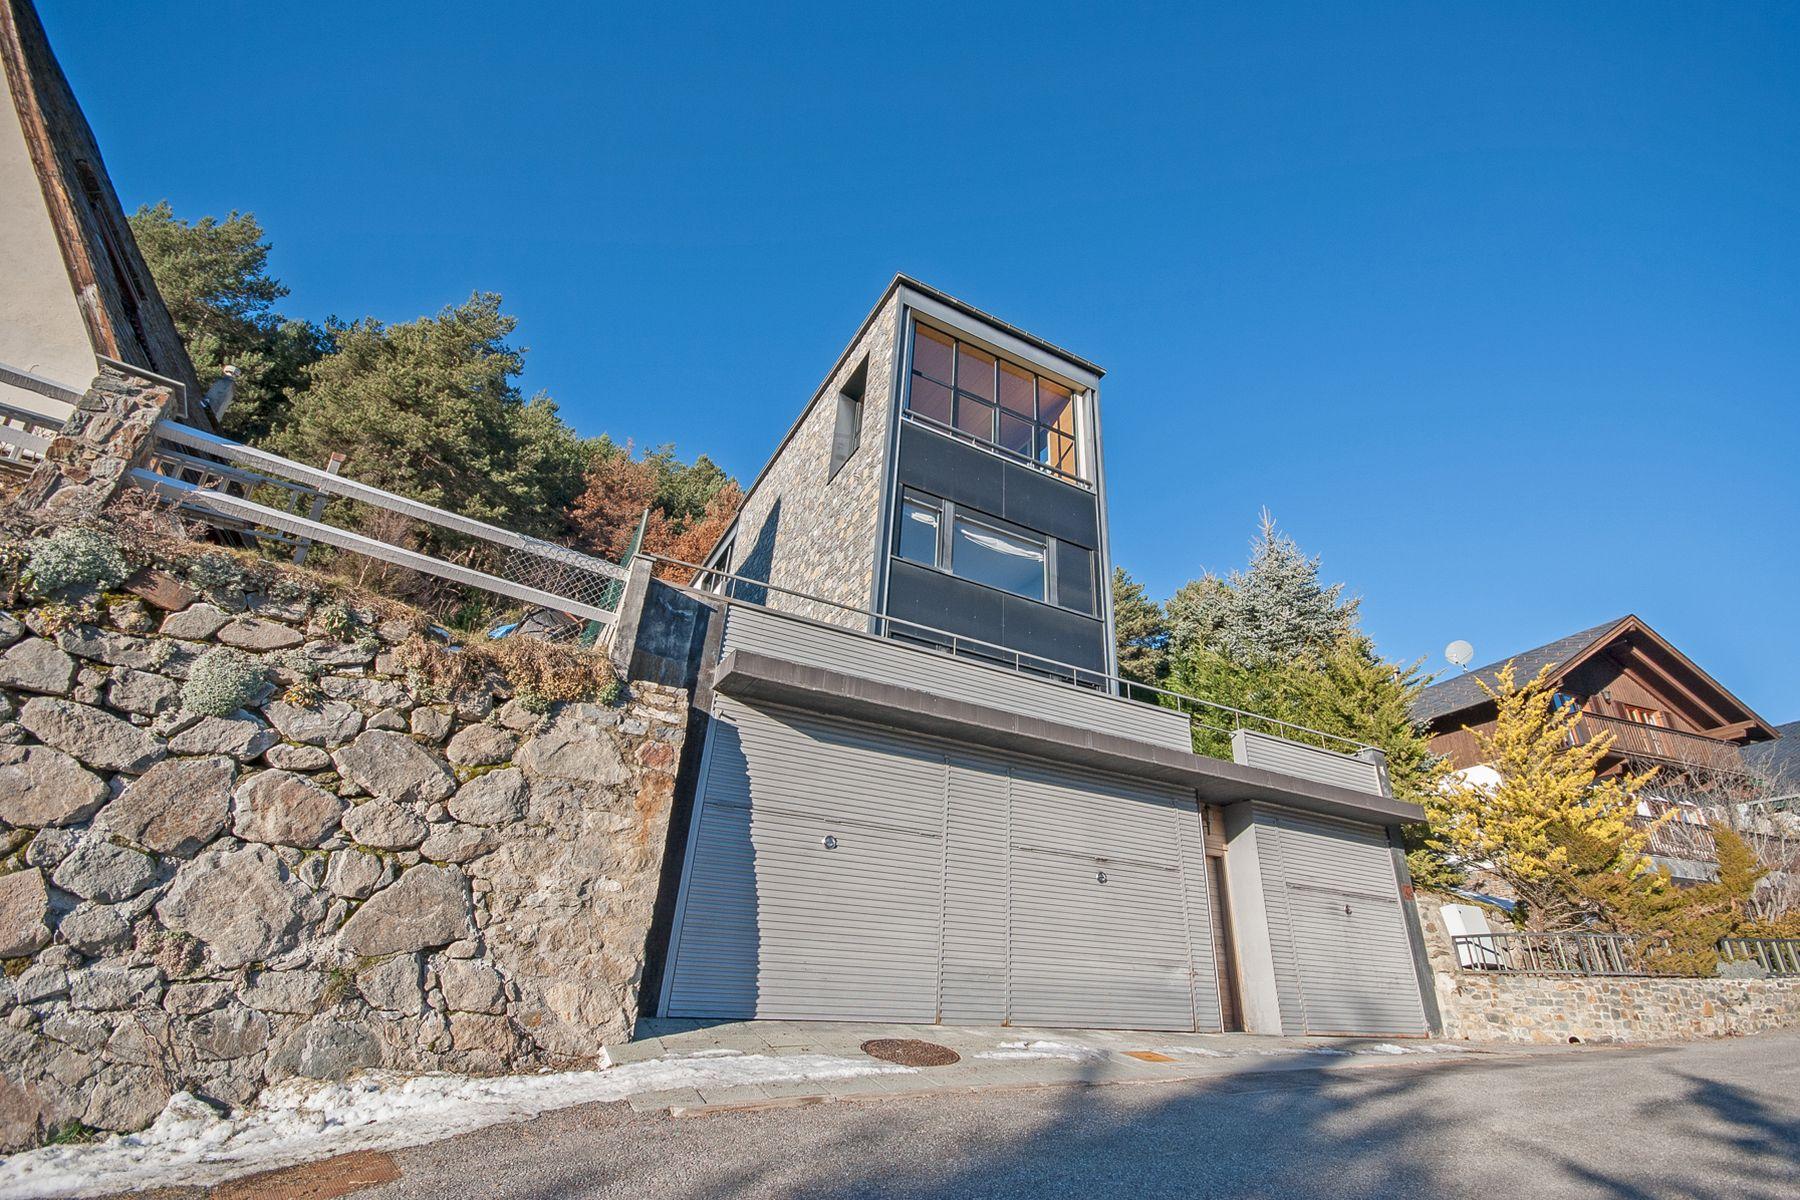 独户住宅 为 销售 在 House for sale in Escas Escas, 马萨纳, AD400 安道尔